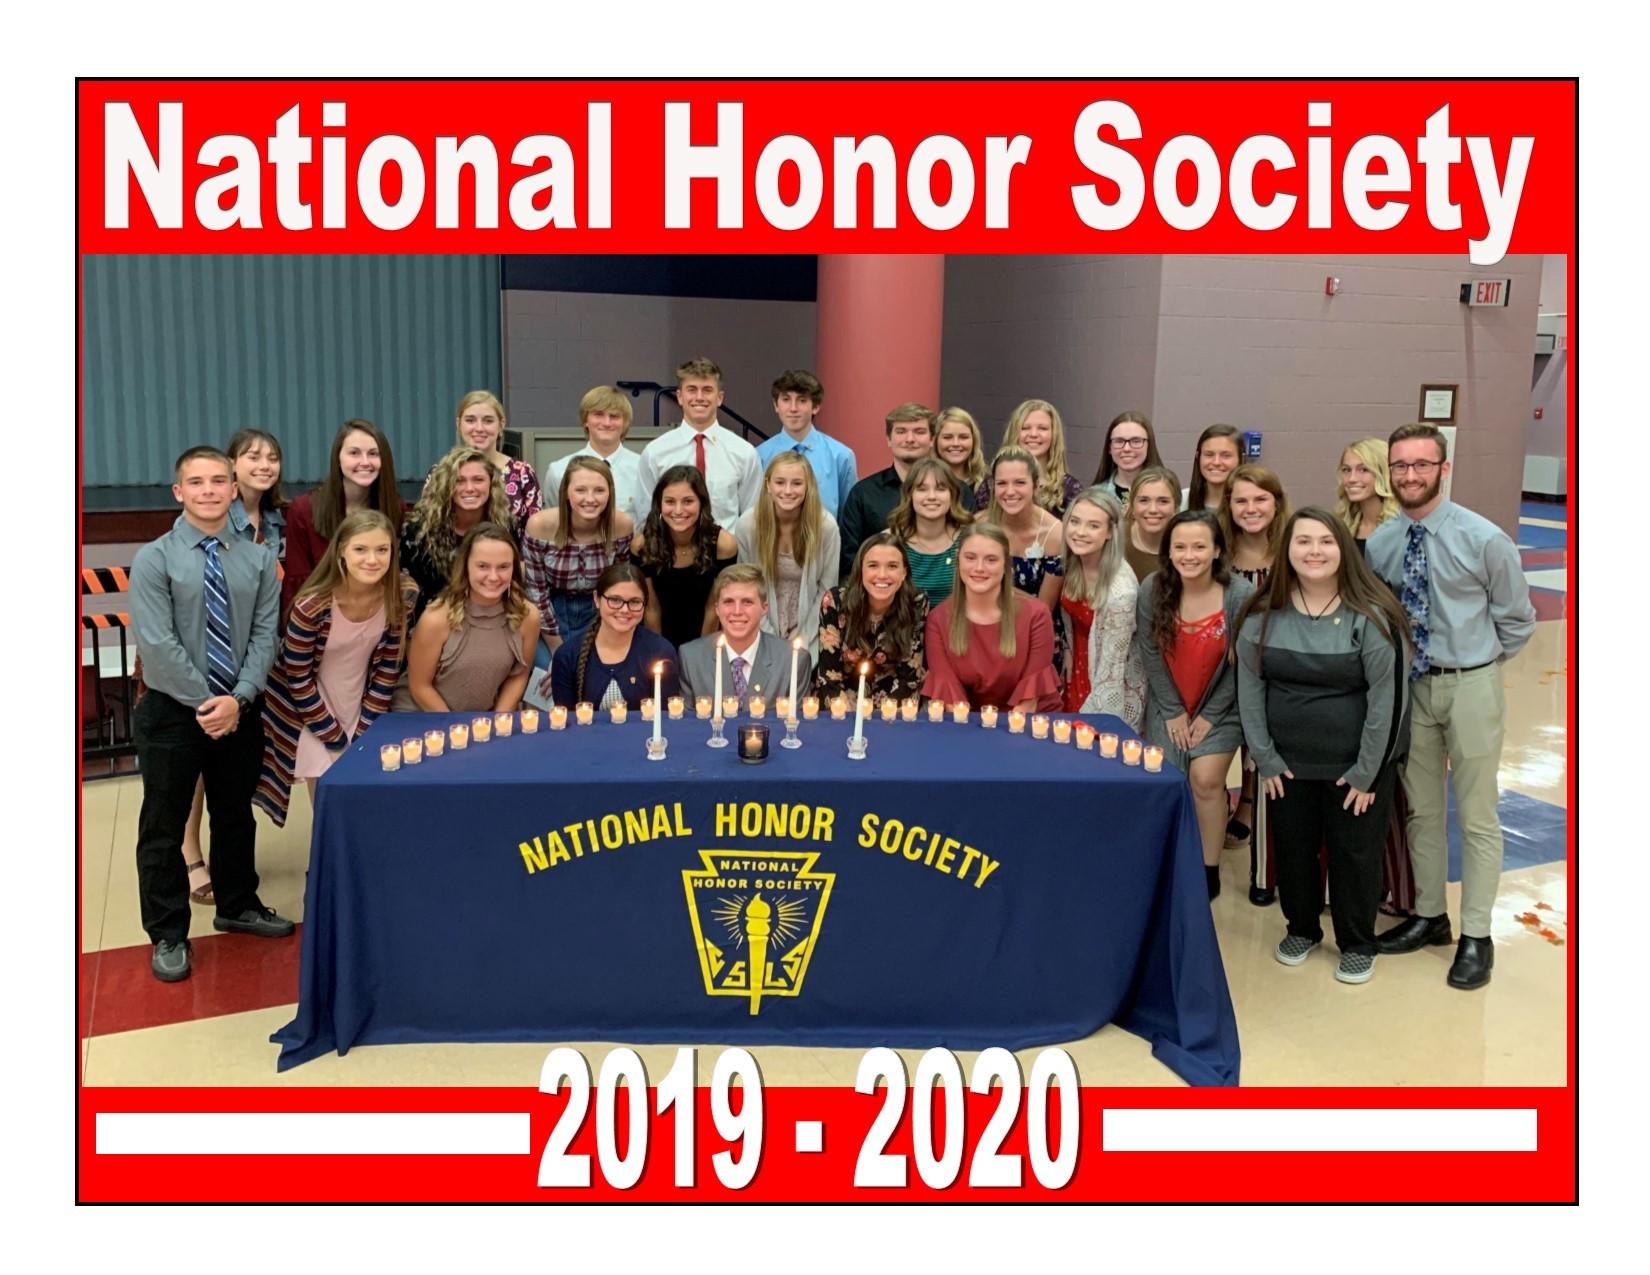 National Honor Society 2019 - 2020